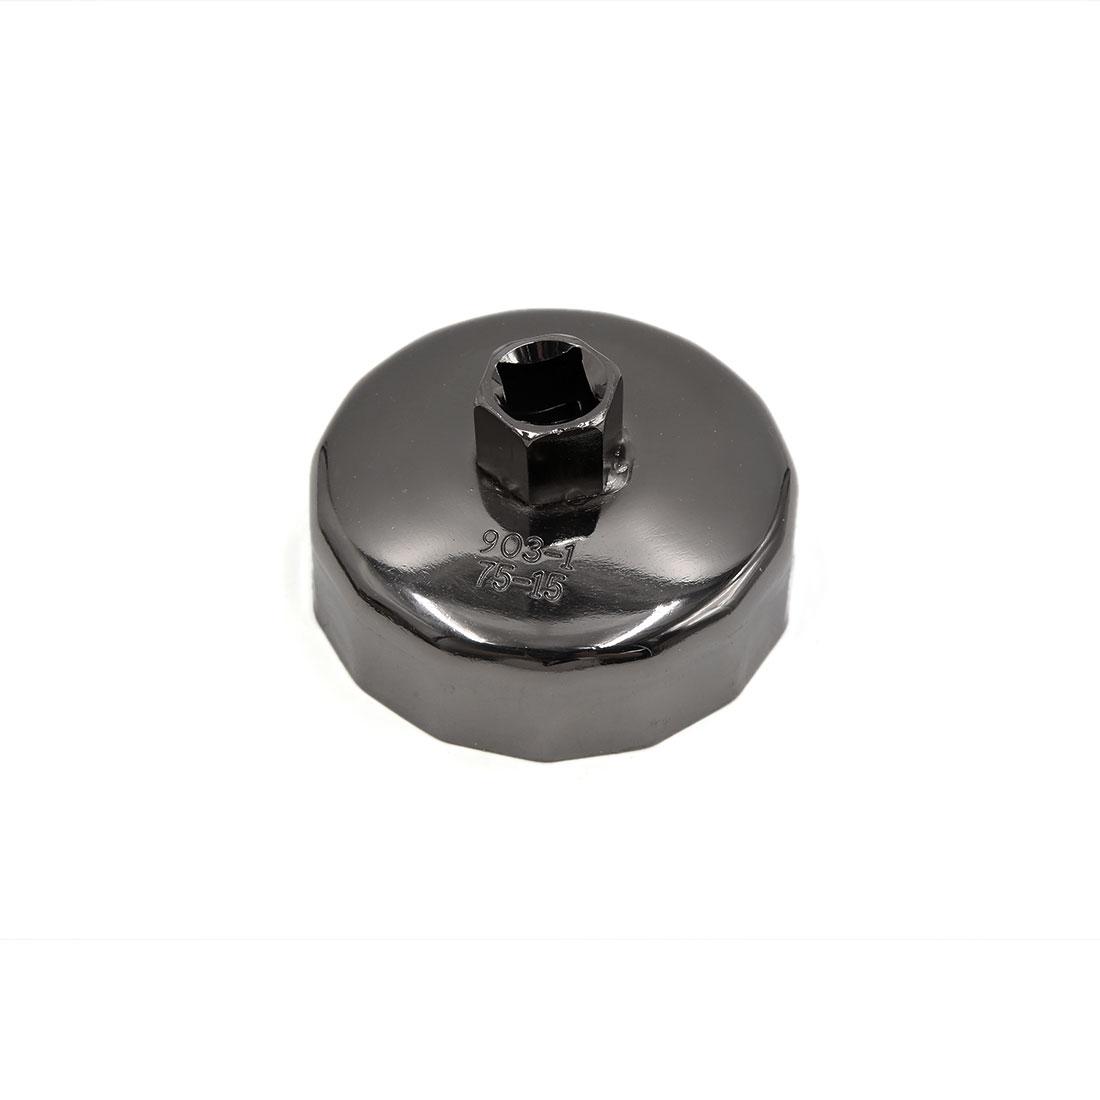 Black Metal 75mm Inner Dia 15 Flutes Car Oil Filter Cap Wrench Socket Remover